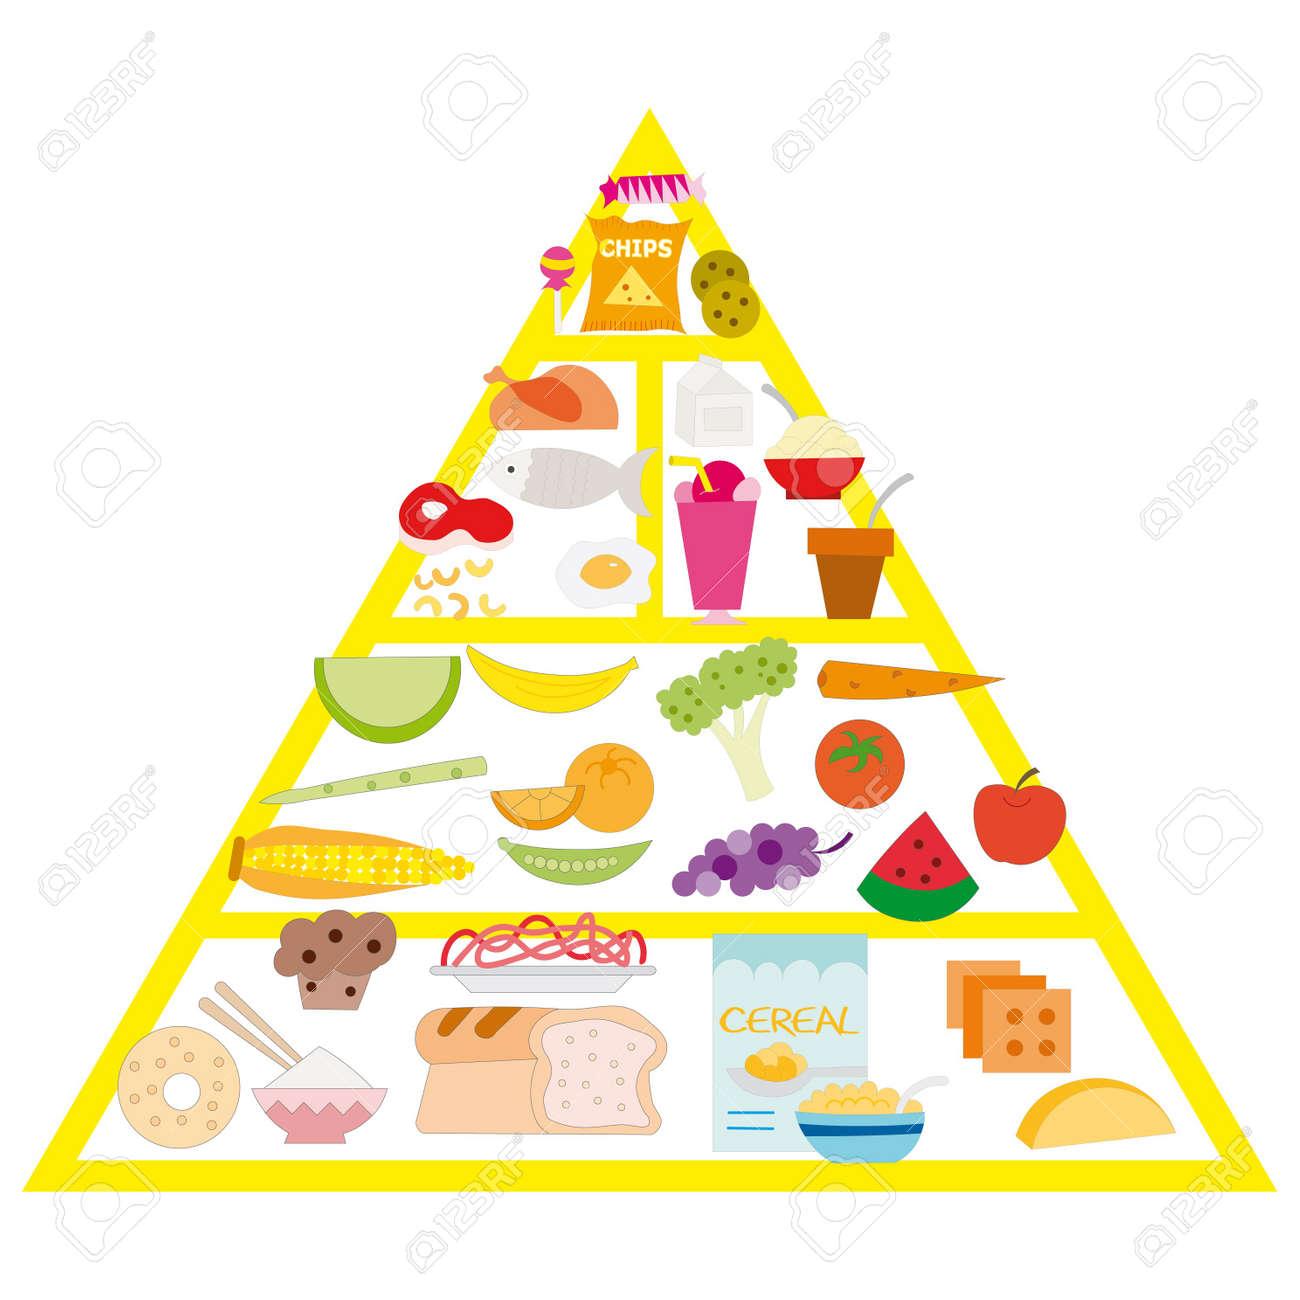 food pyramid illustartion on the white background Stock Vector - 7696428